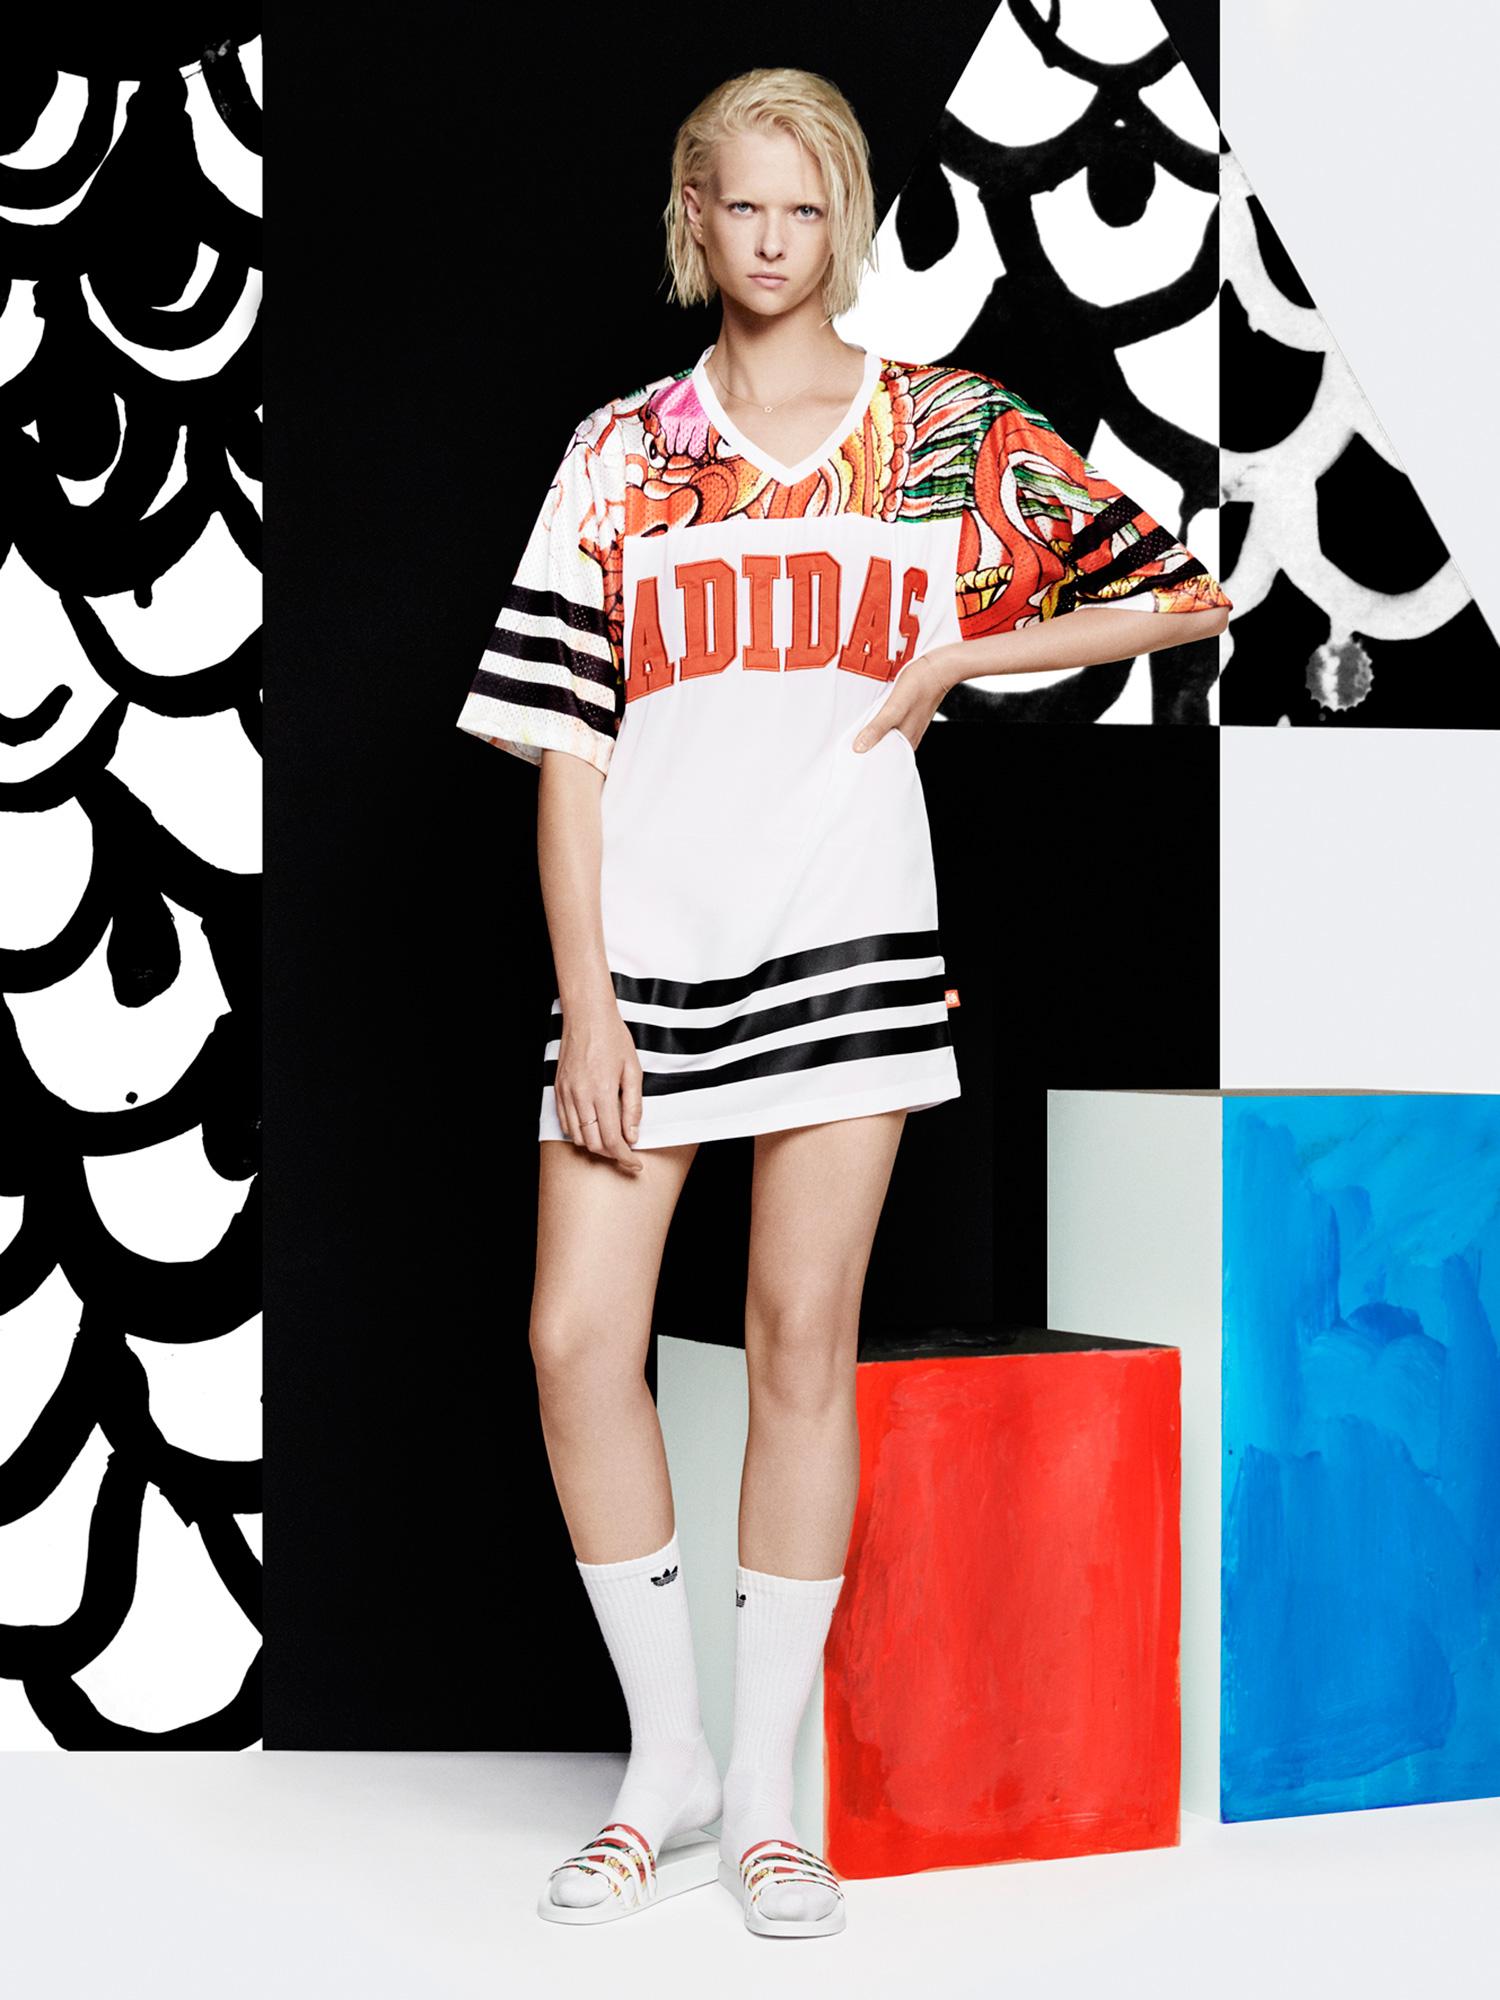 big sale 2d09e 1ce9c adidas Originals by Rita Ora SpringSummer 2015 Collection